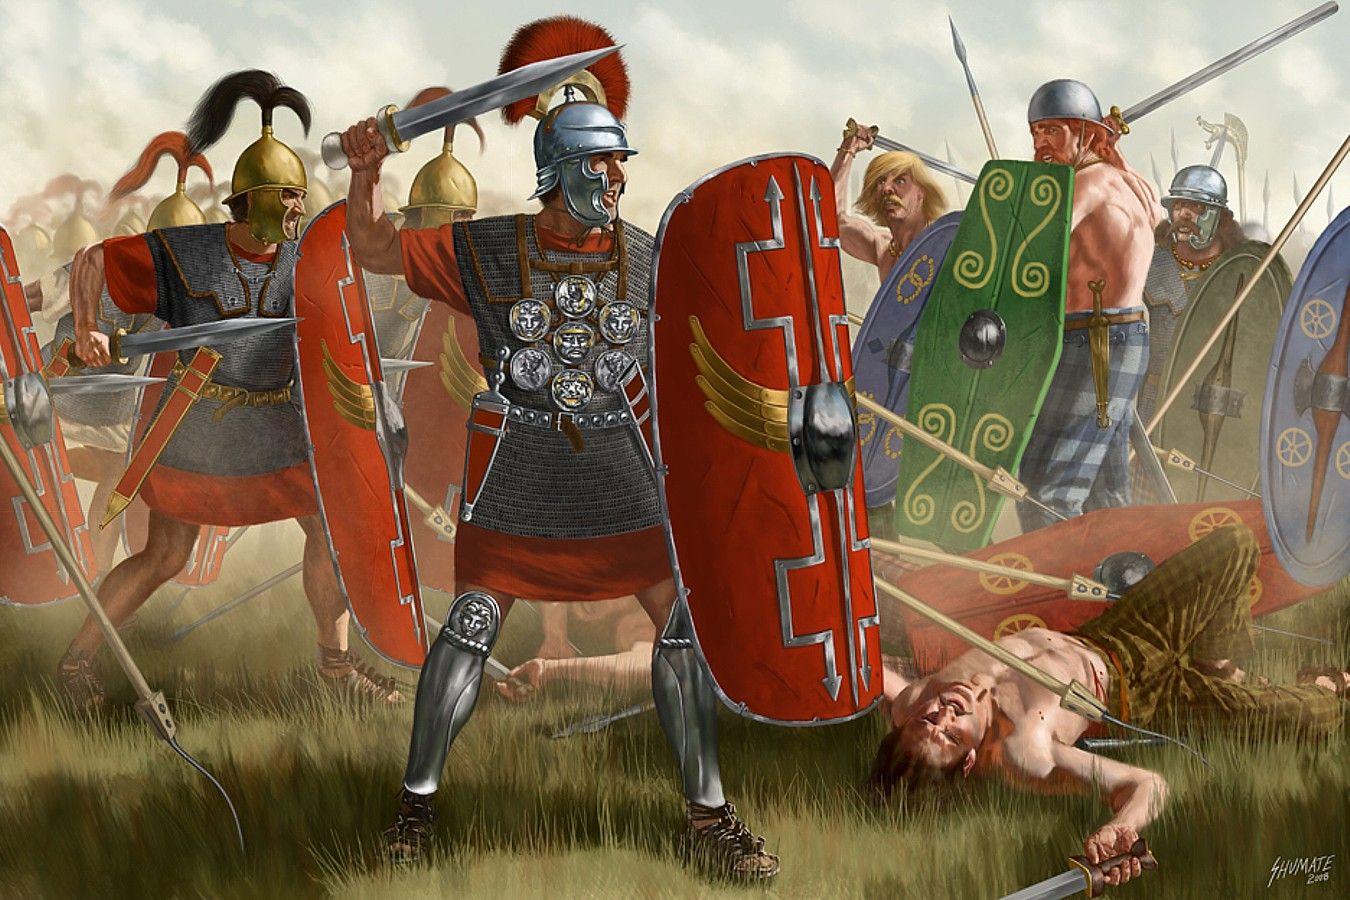 Roman legions battling against Gallic warriors